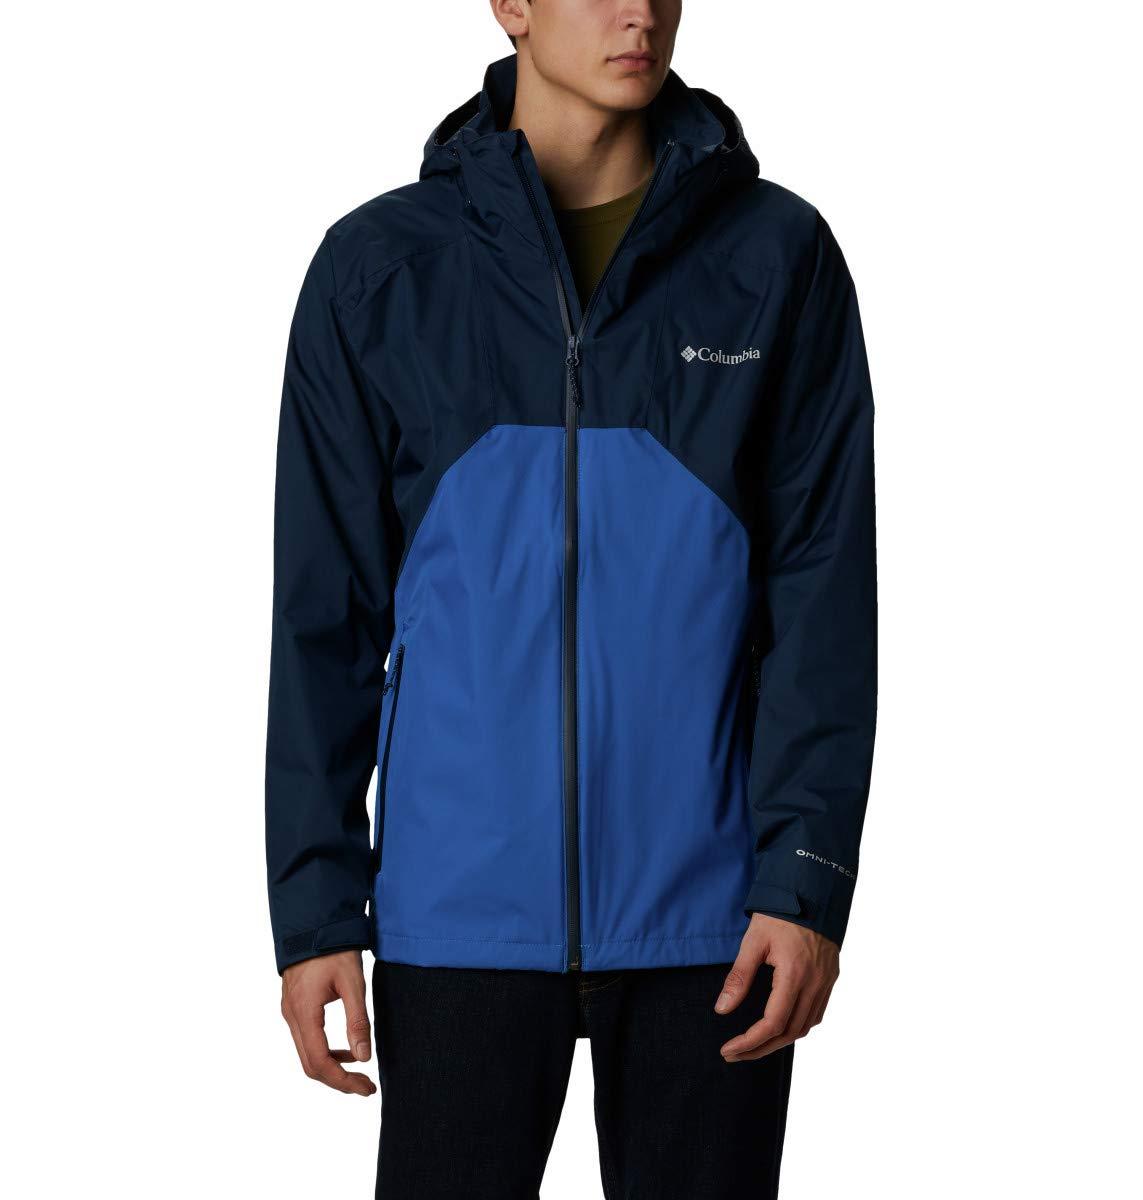 Columbia Rain Scape Jacket Homme